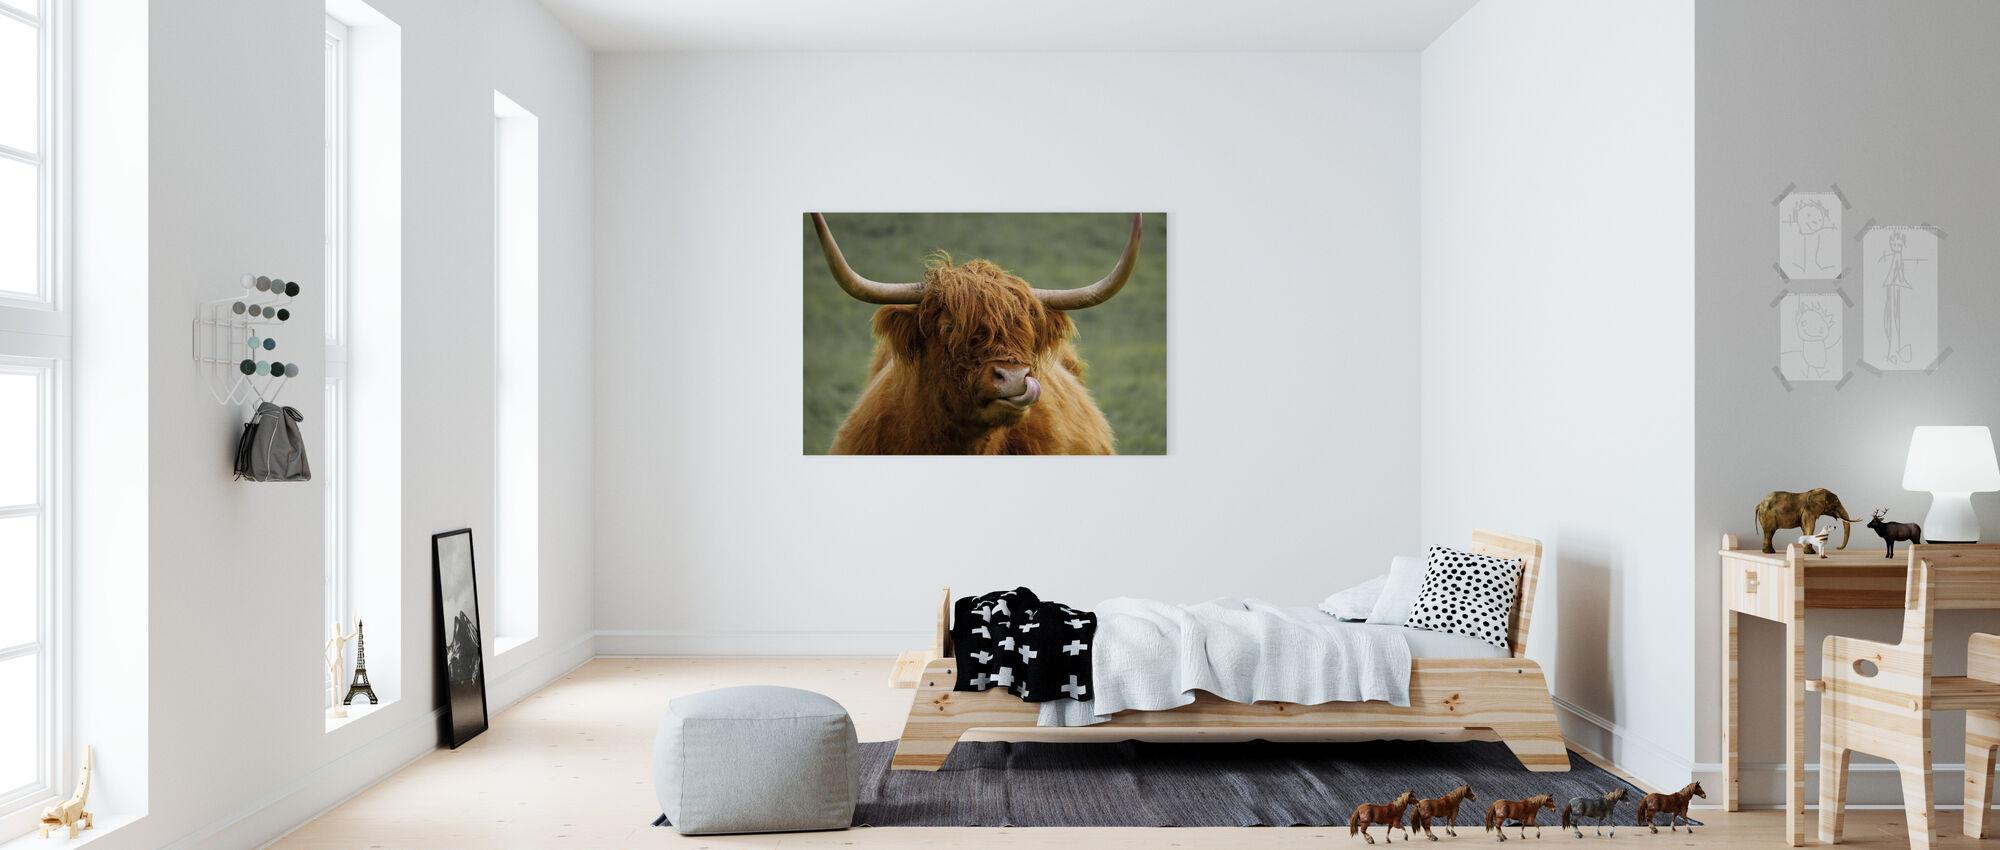 Highland Cattle - Canvas print - Kids Room